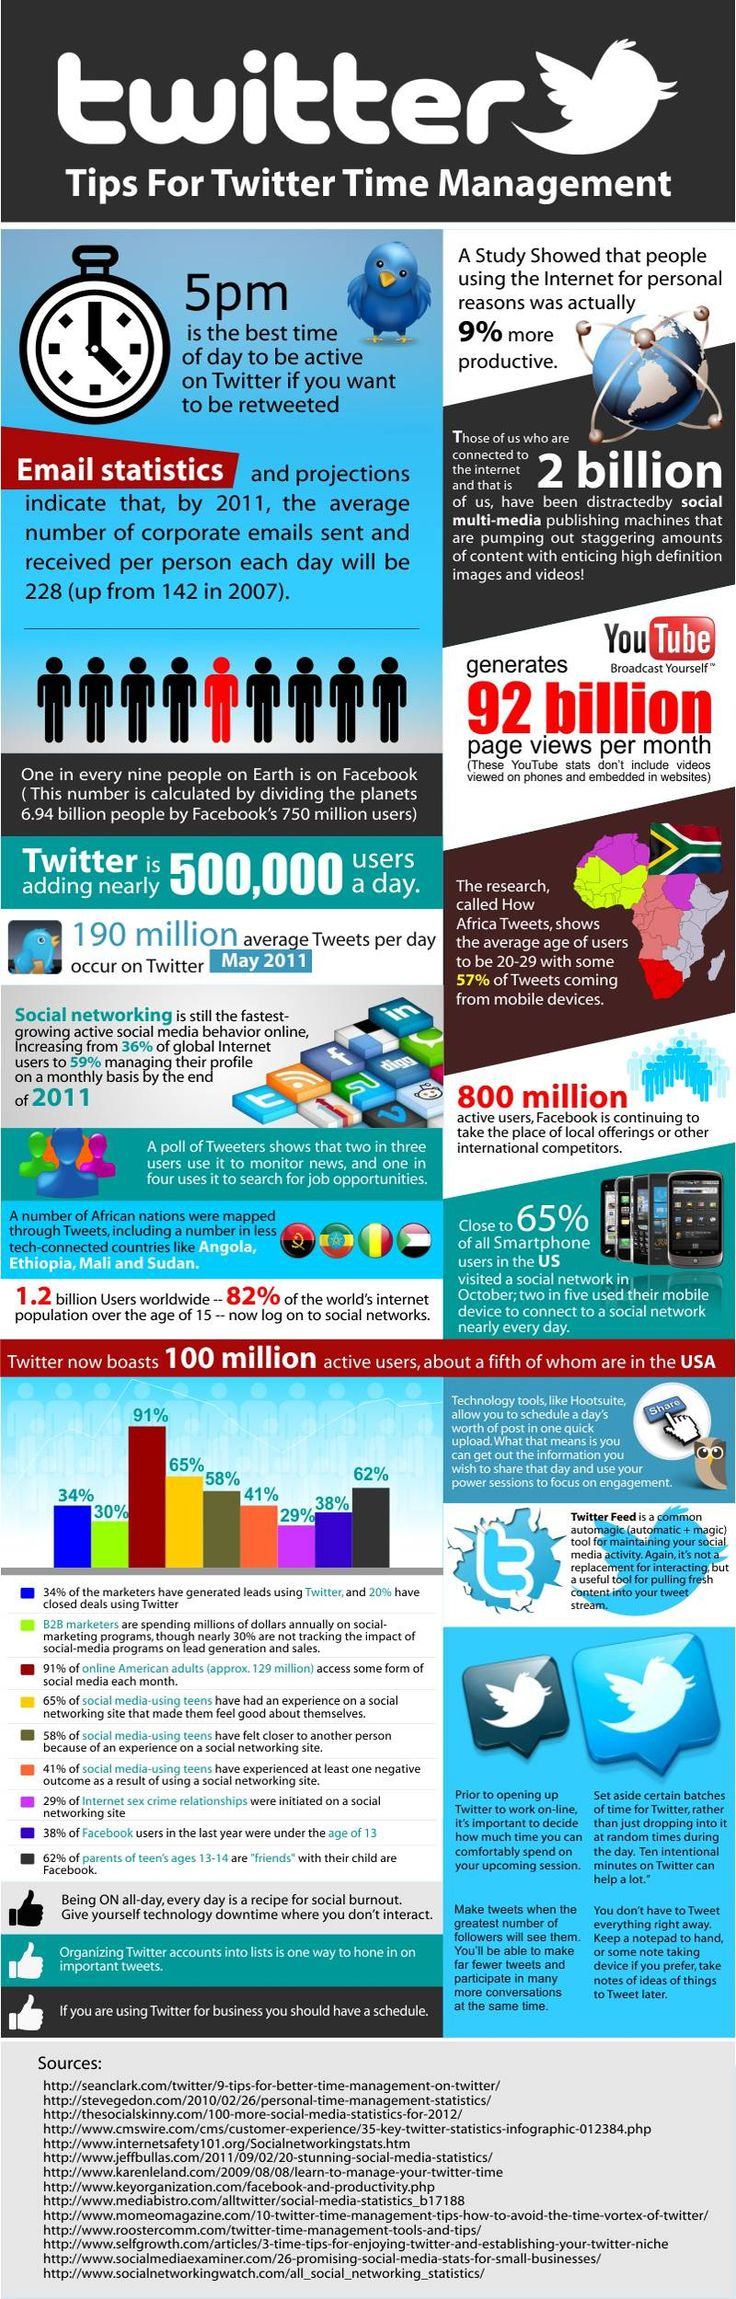 Tips for #Twitter Time Management.:  Internet Site, Time Management, Socialmedia Dsmi,  Website, Web Site, Twitter Timemanag, Social Media, Tips, Infographic